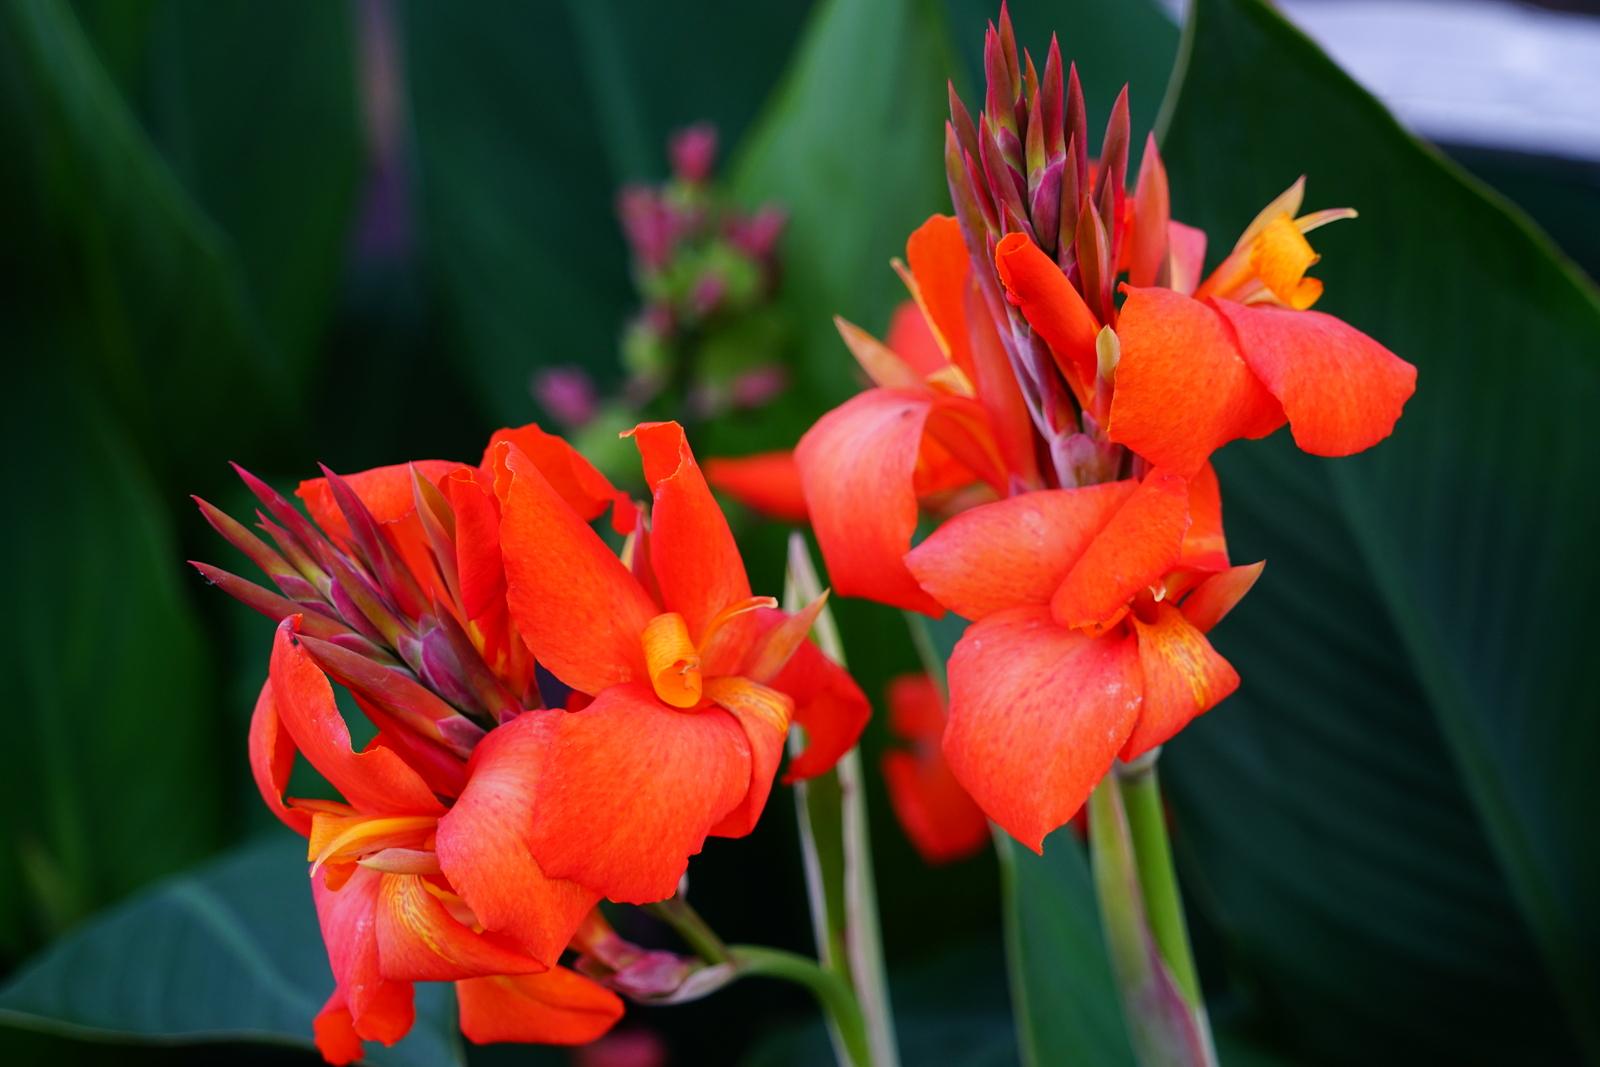 Anura Guruge Woods Hole flowers Massachusetts Sony a7 II August 23 2017